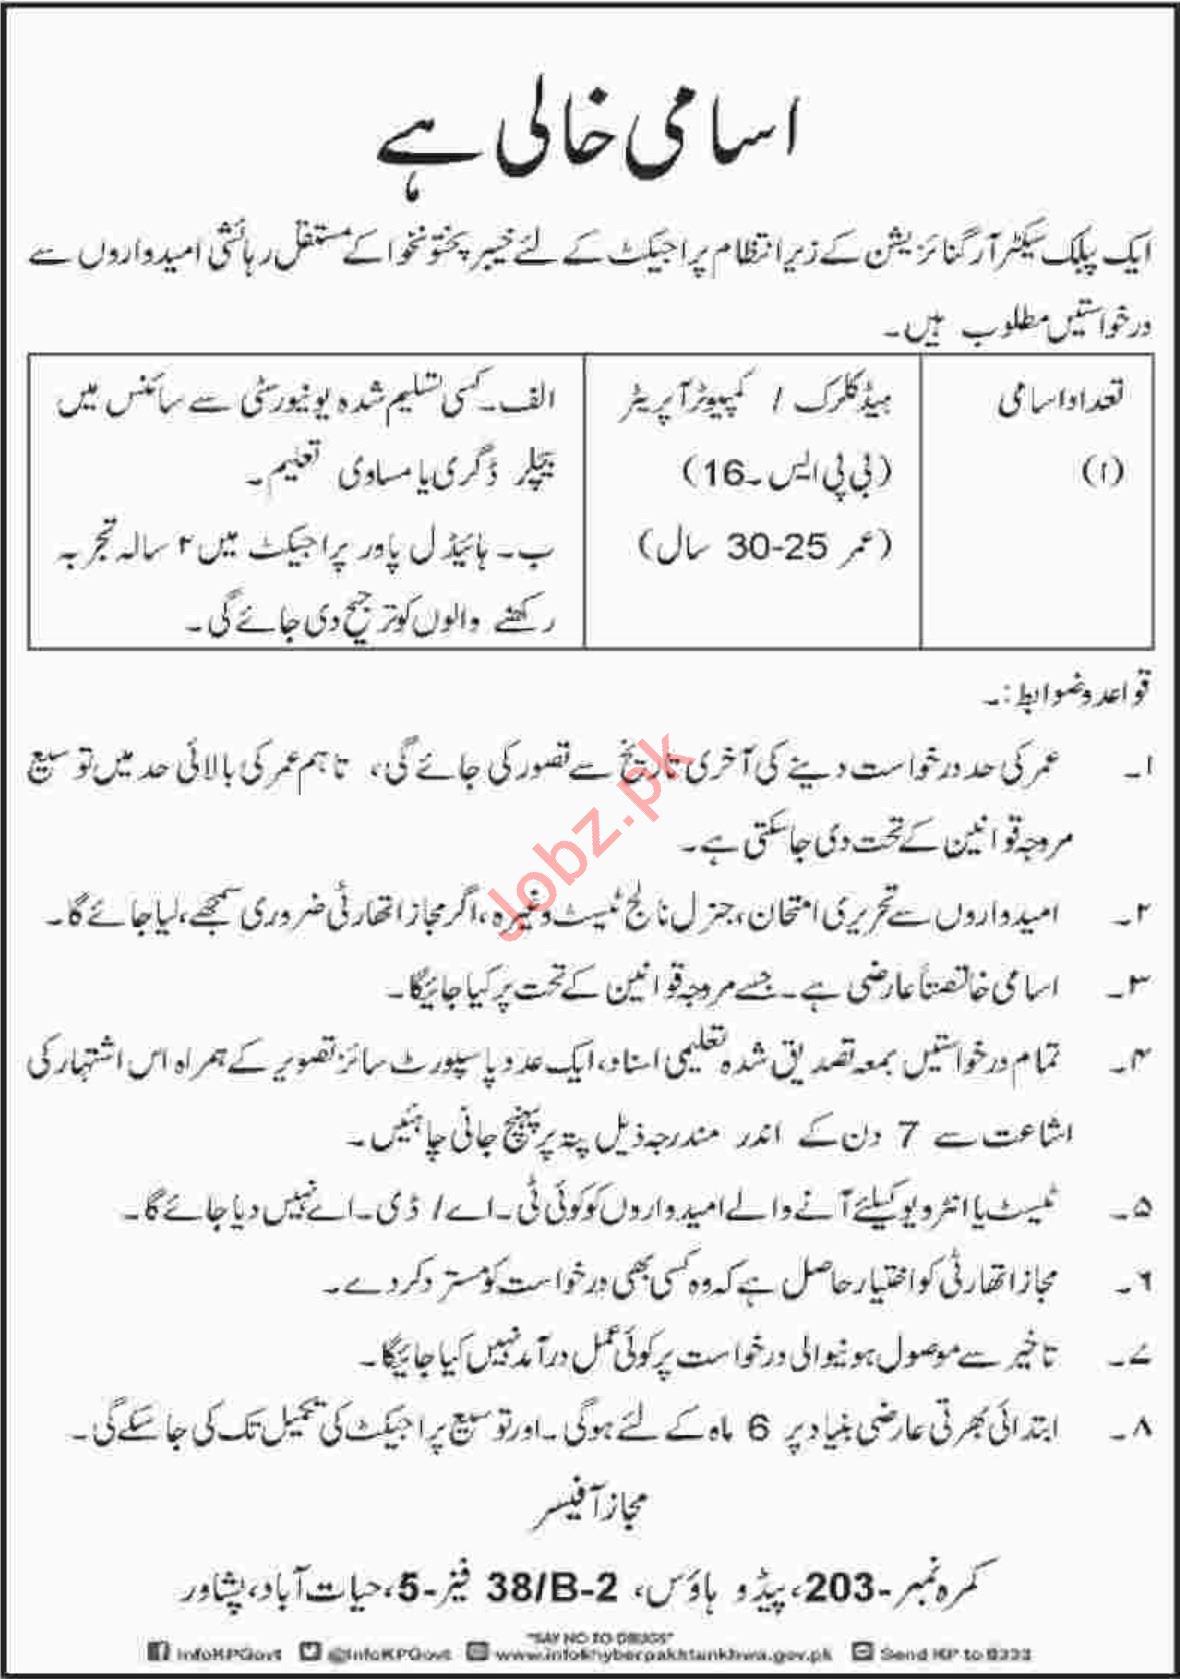 Public Sector Organization KPK Jobs for Head Clerk